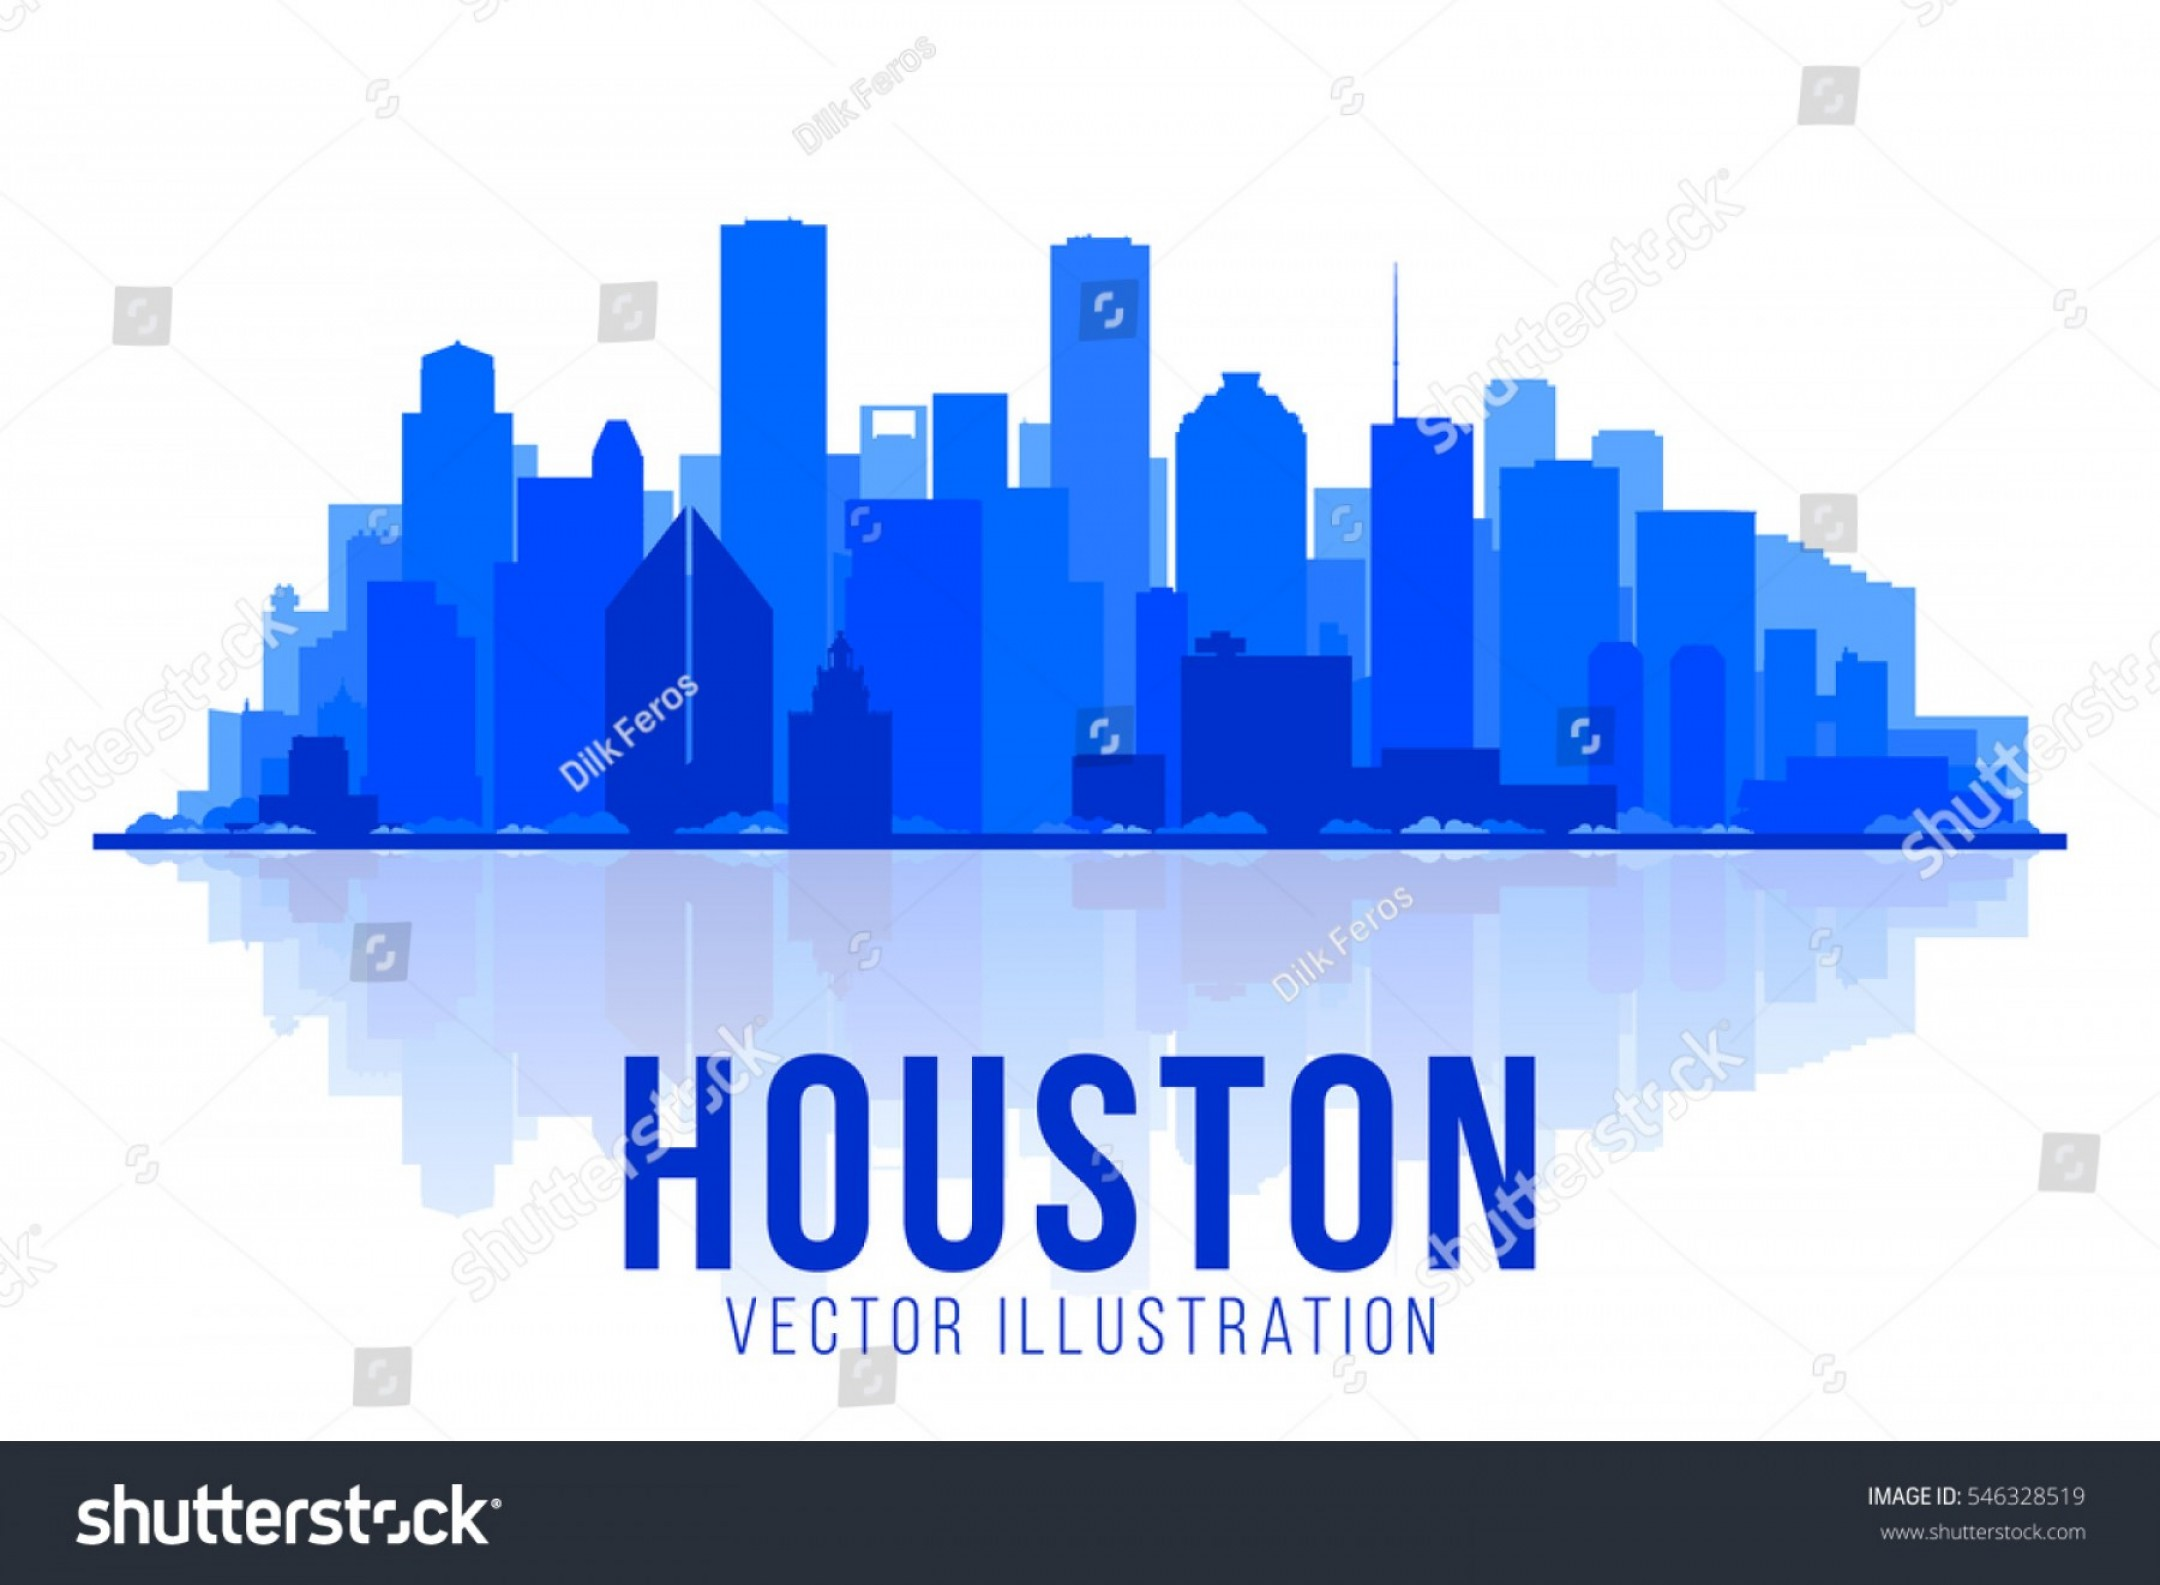 2160x1585 Houston Texas Silhouette Vector Illustration Main Arenawp